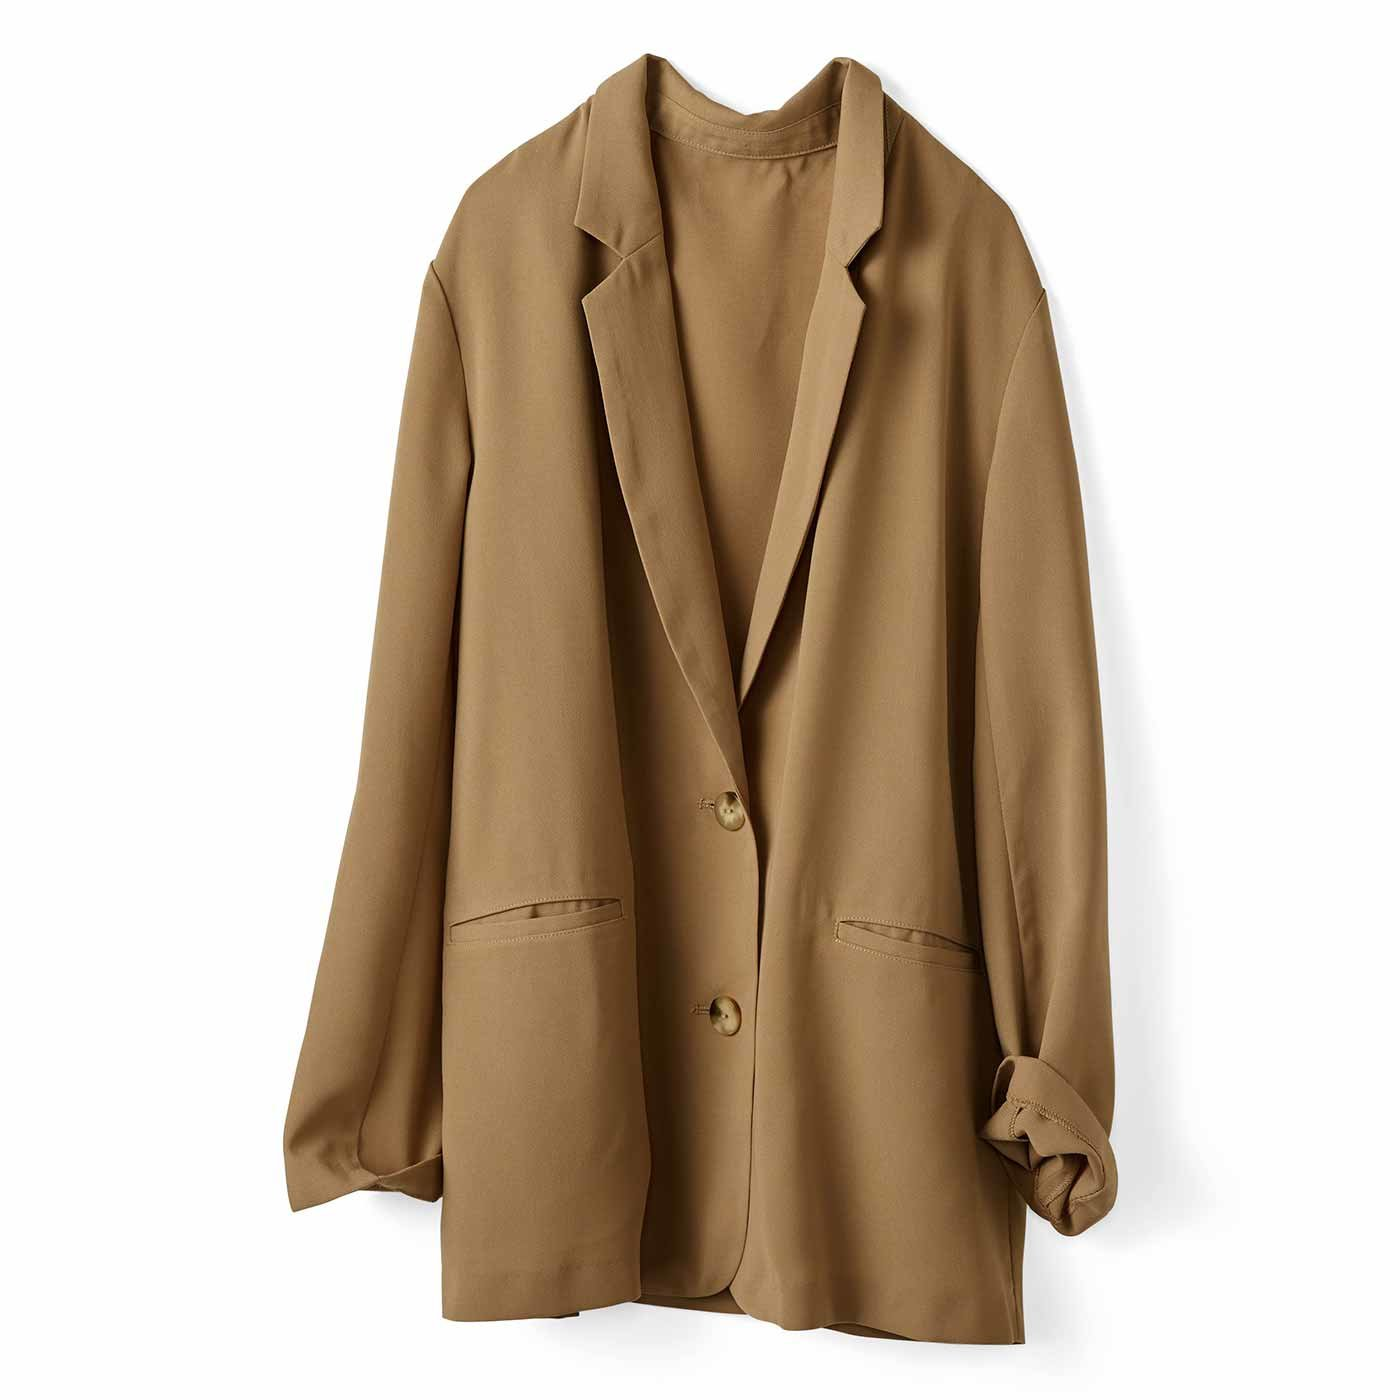 IEDIT[イディット] 接触冷感でサラリと着られる 軽やかジャケット〈ベージュ〉